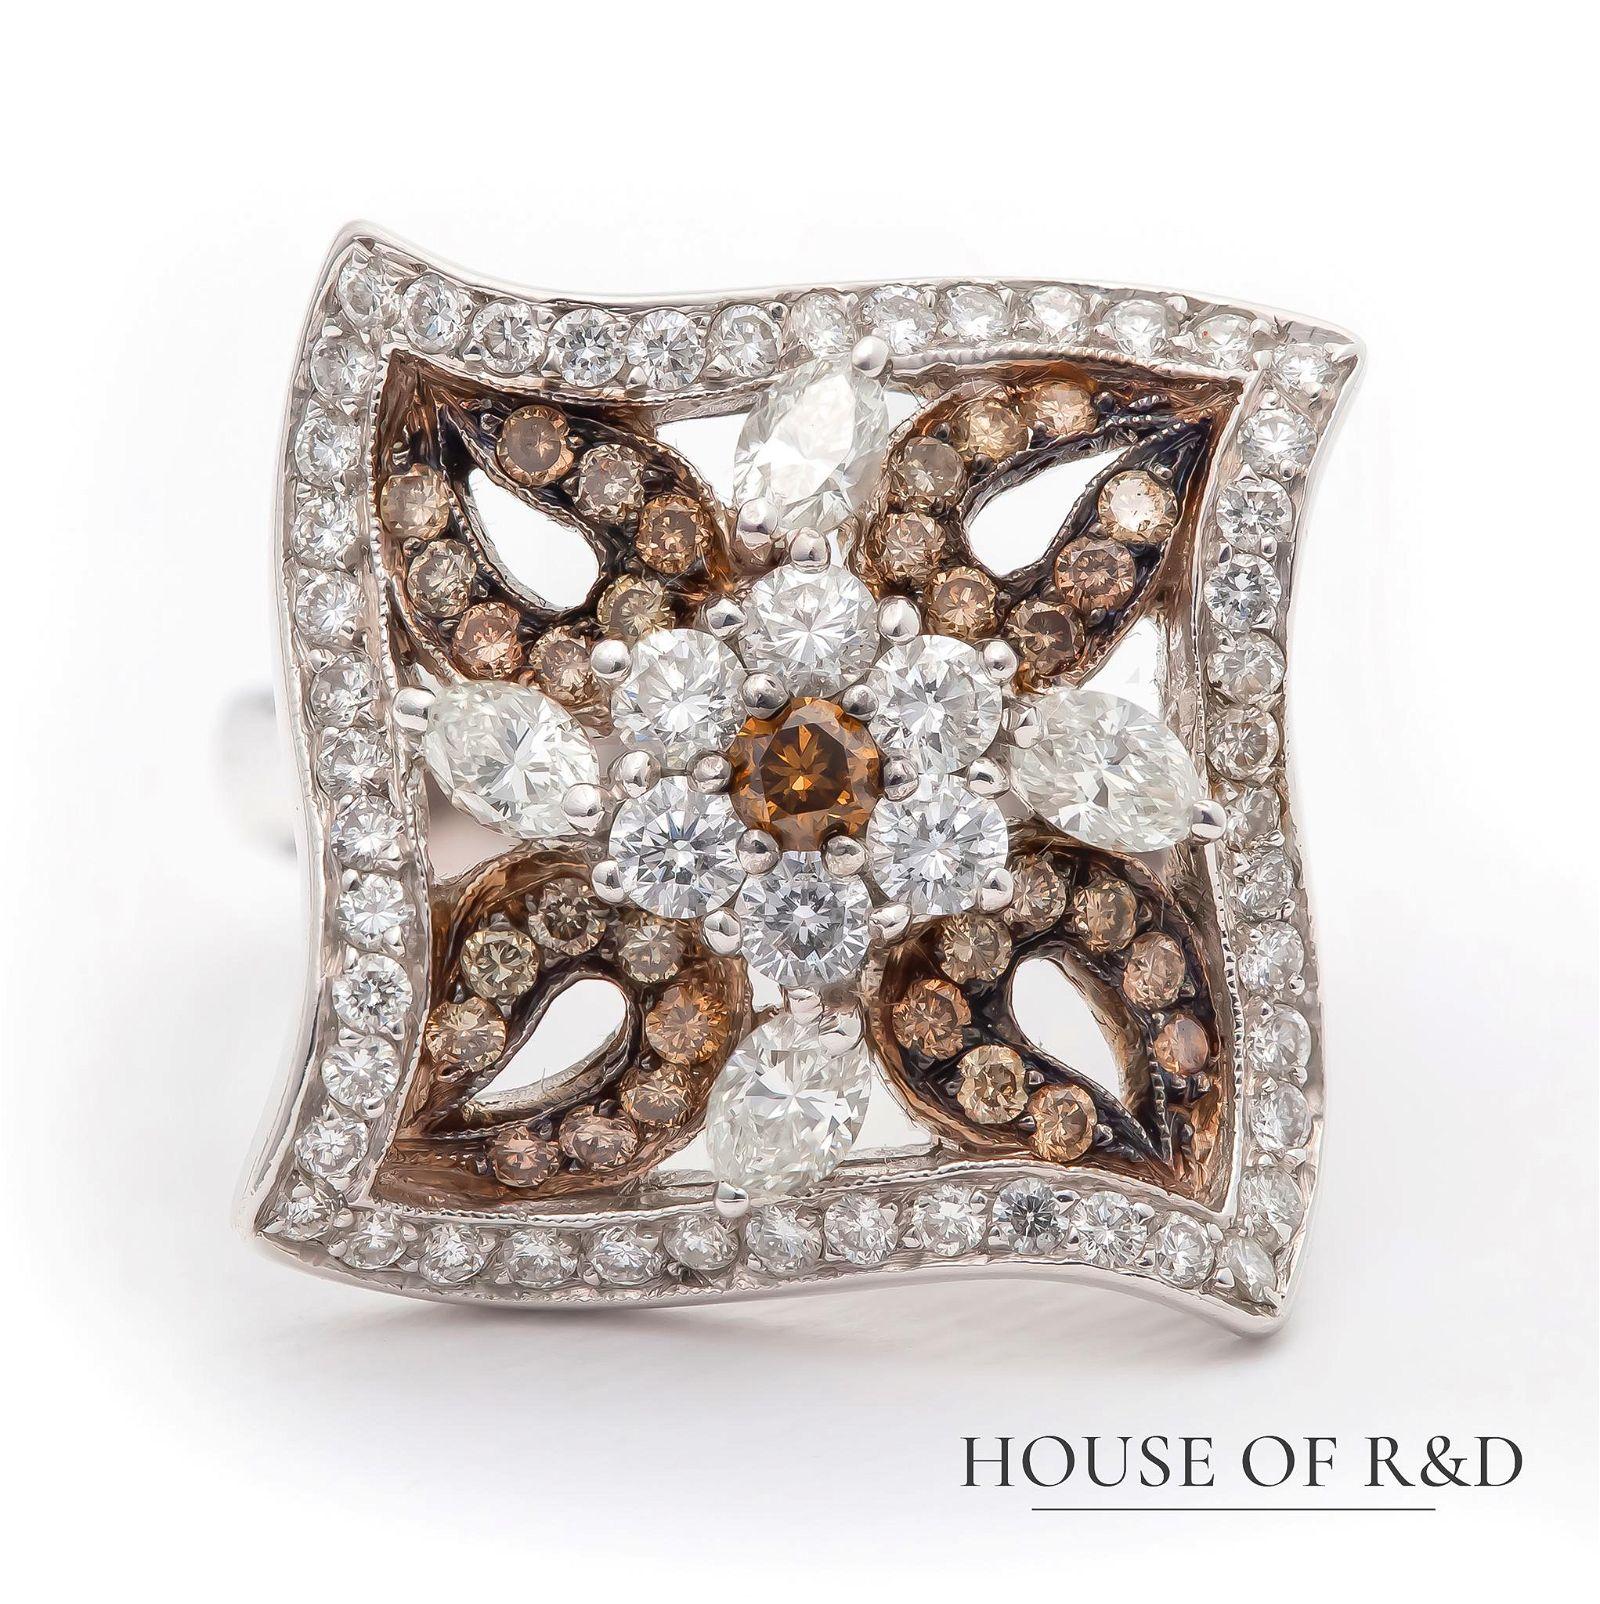 18k White Gold - 1.33tcw -  Diamonds Ring